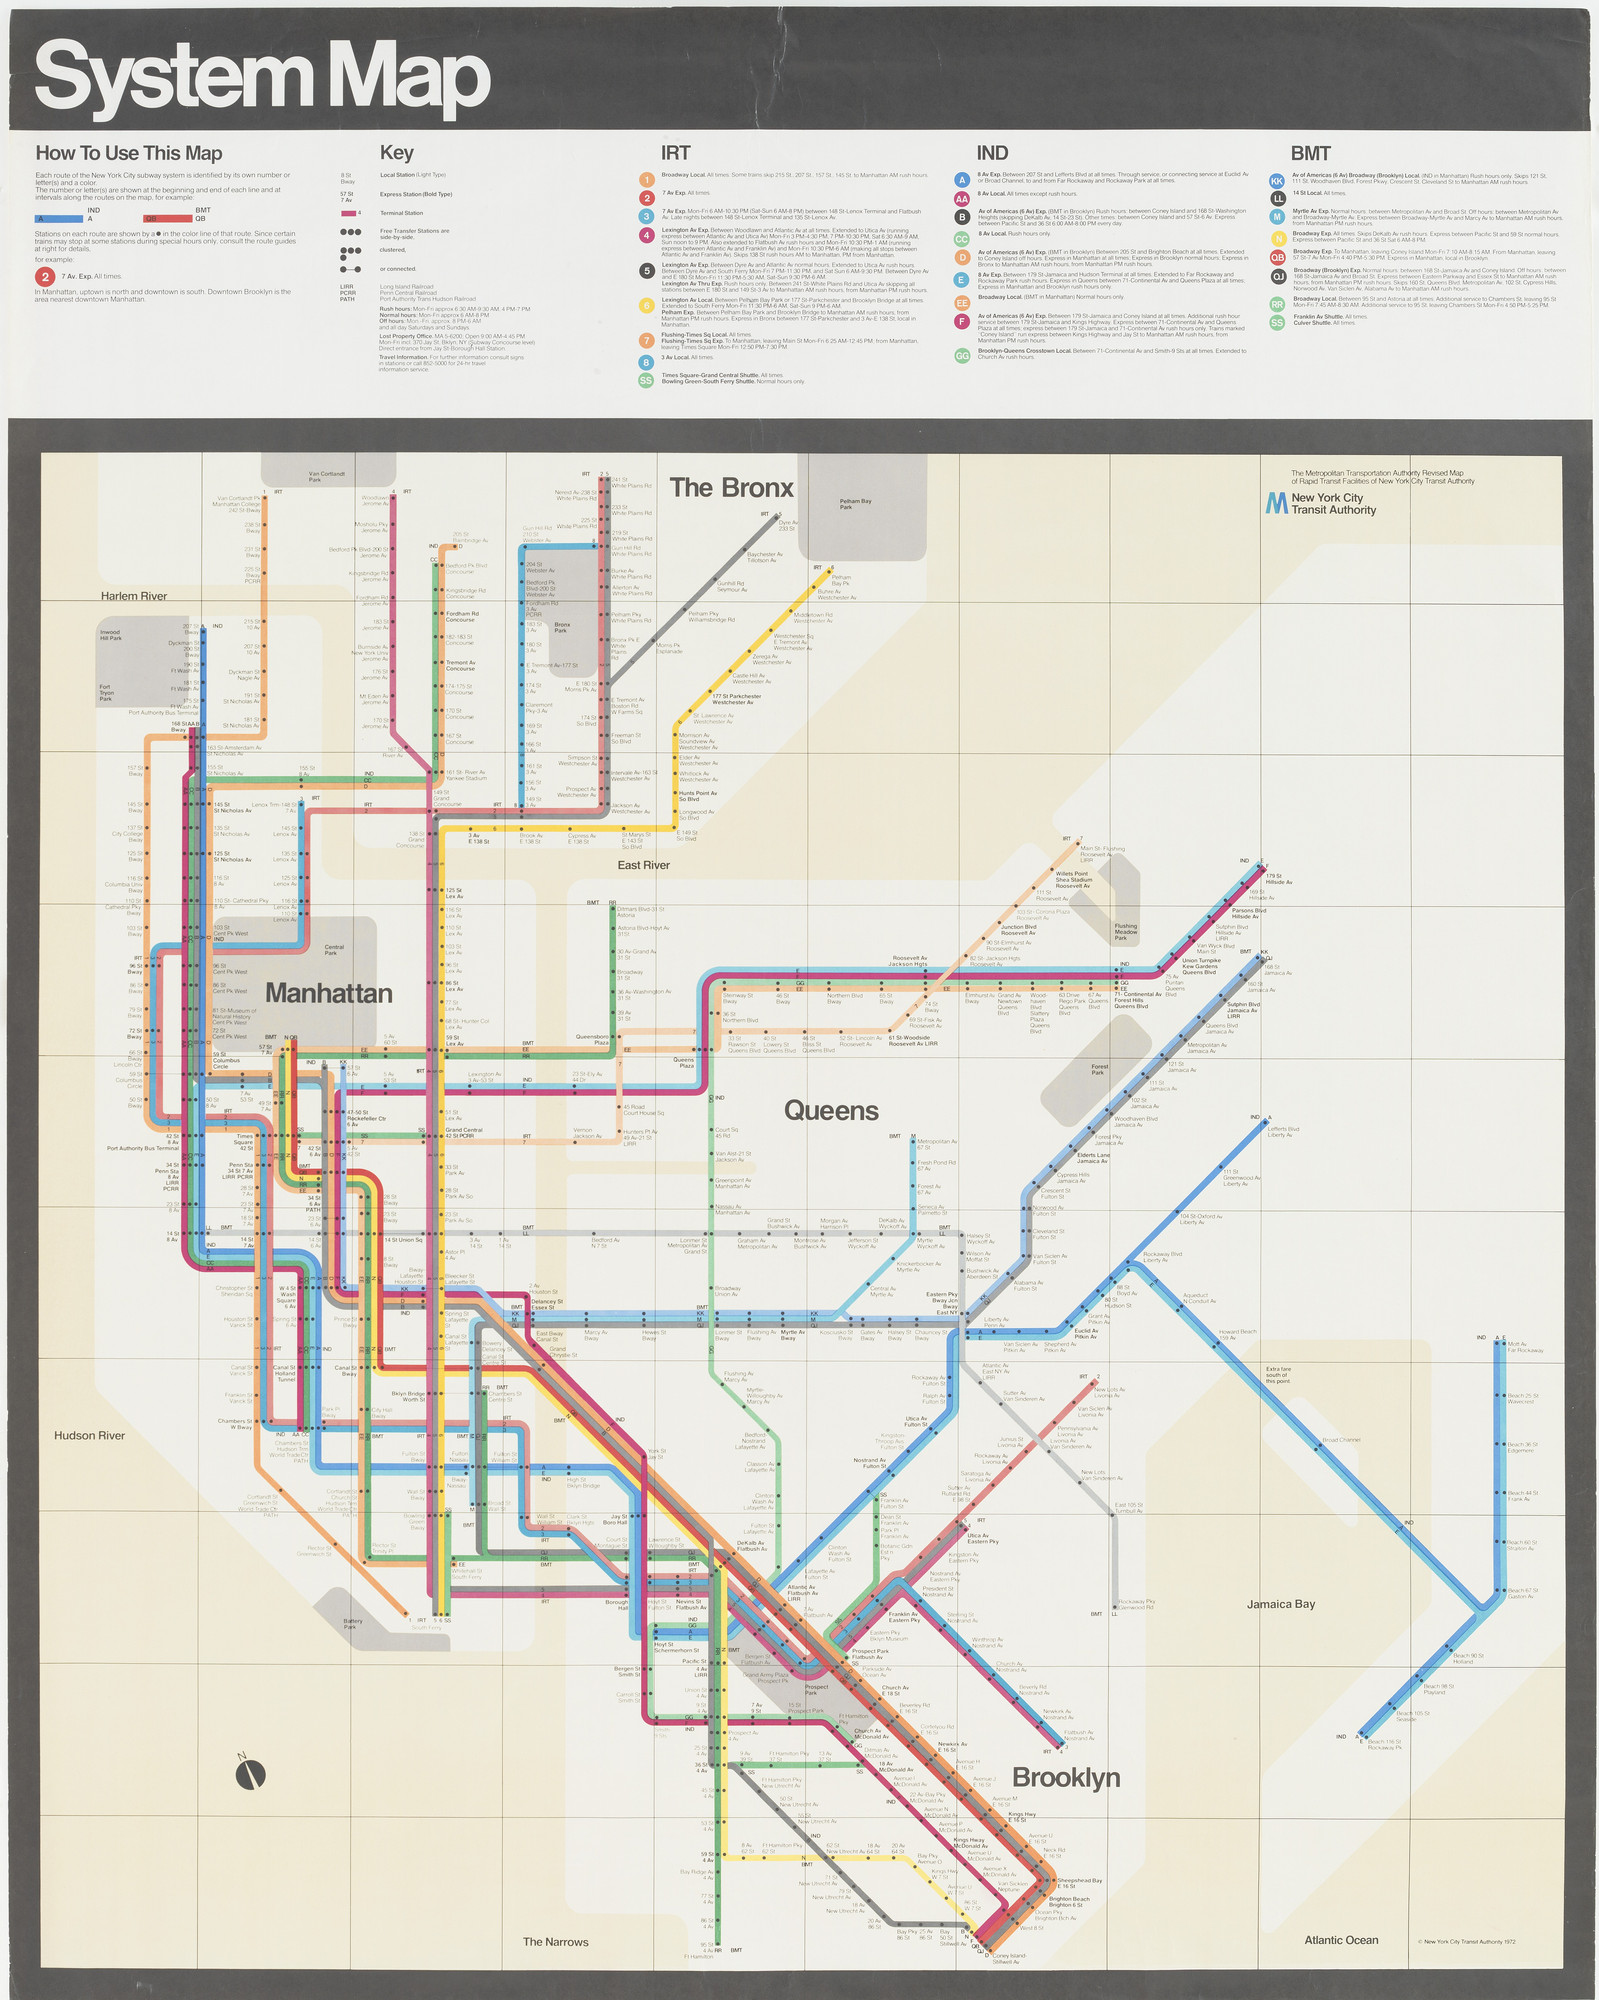 New York Subway Map Vignelli.Massimo Vignelli Joan Charysyn Bob Noorda Unimark International